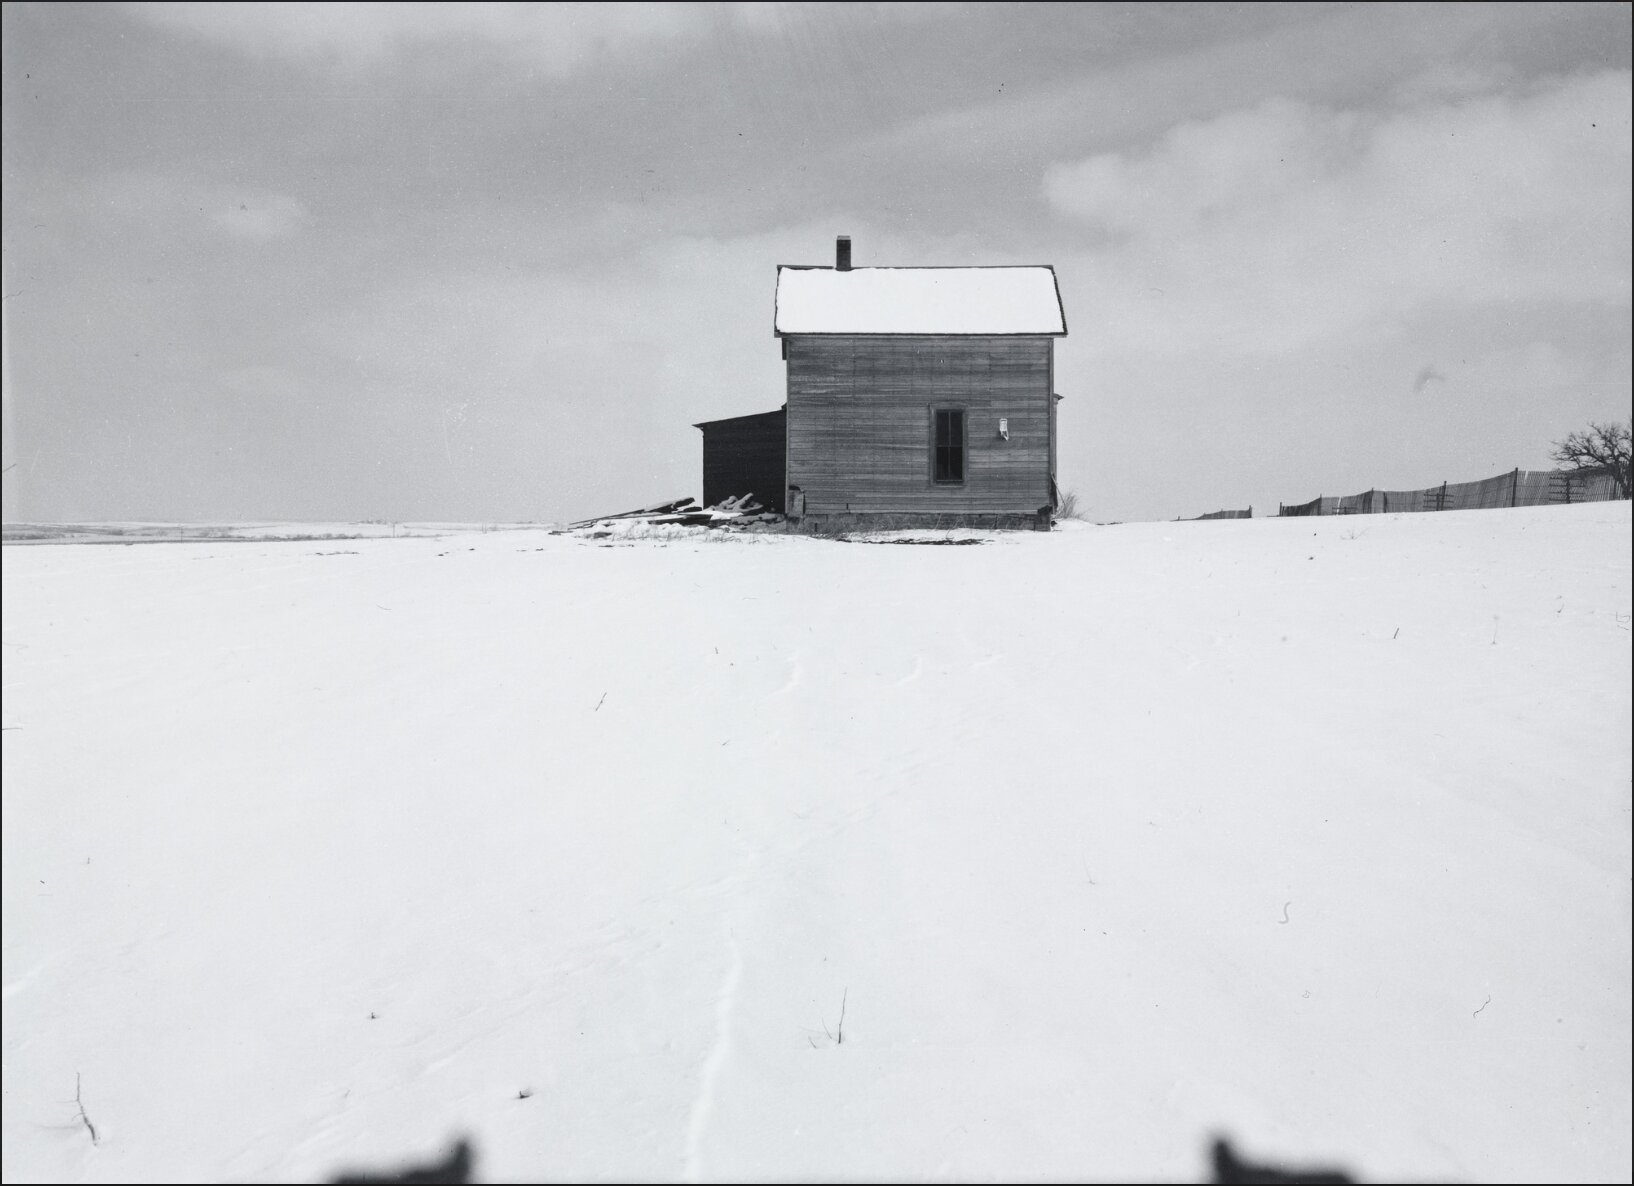 ferme en hiver